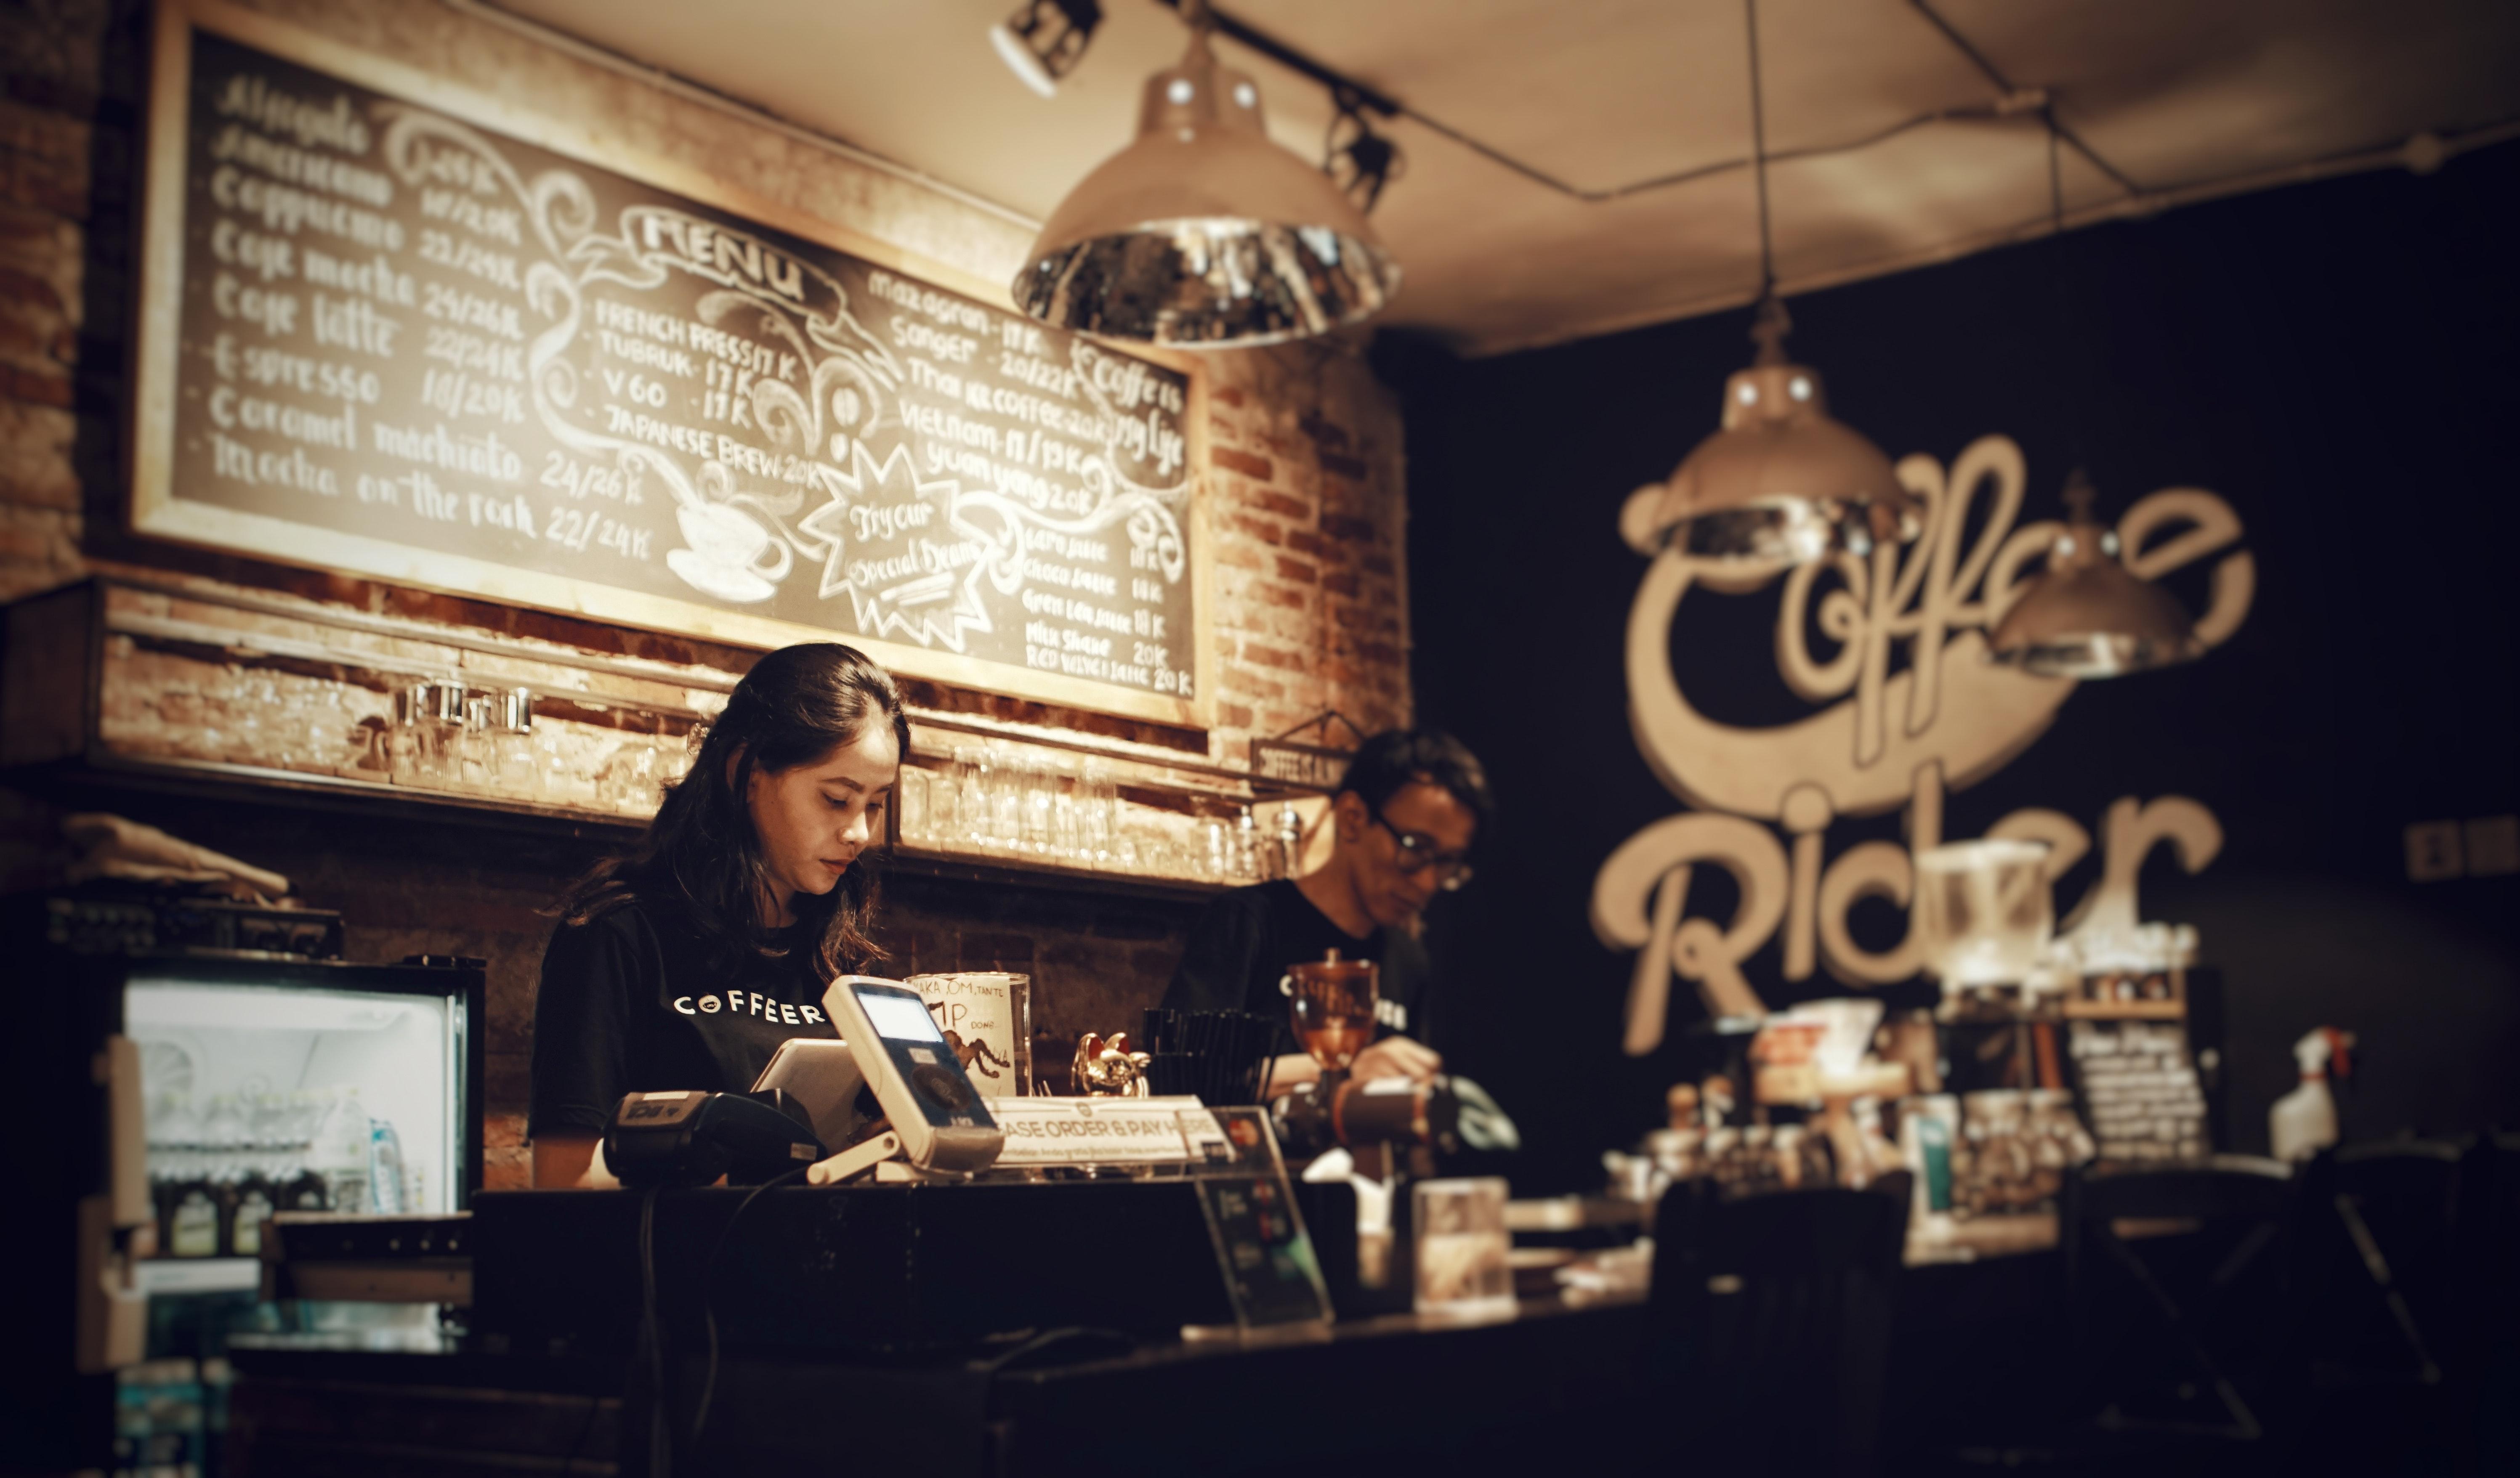 Coffee Shop, Barista, Barista girl, Business, Cafe, HQ Photo